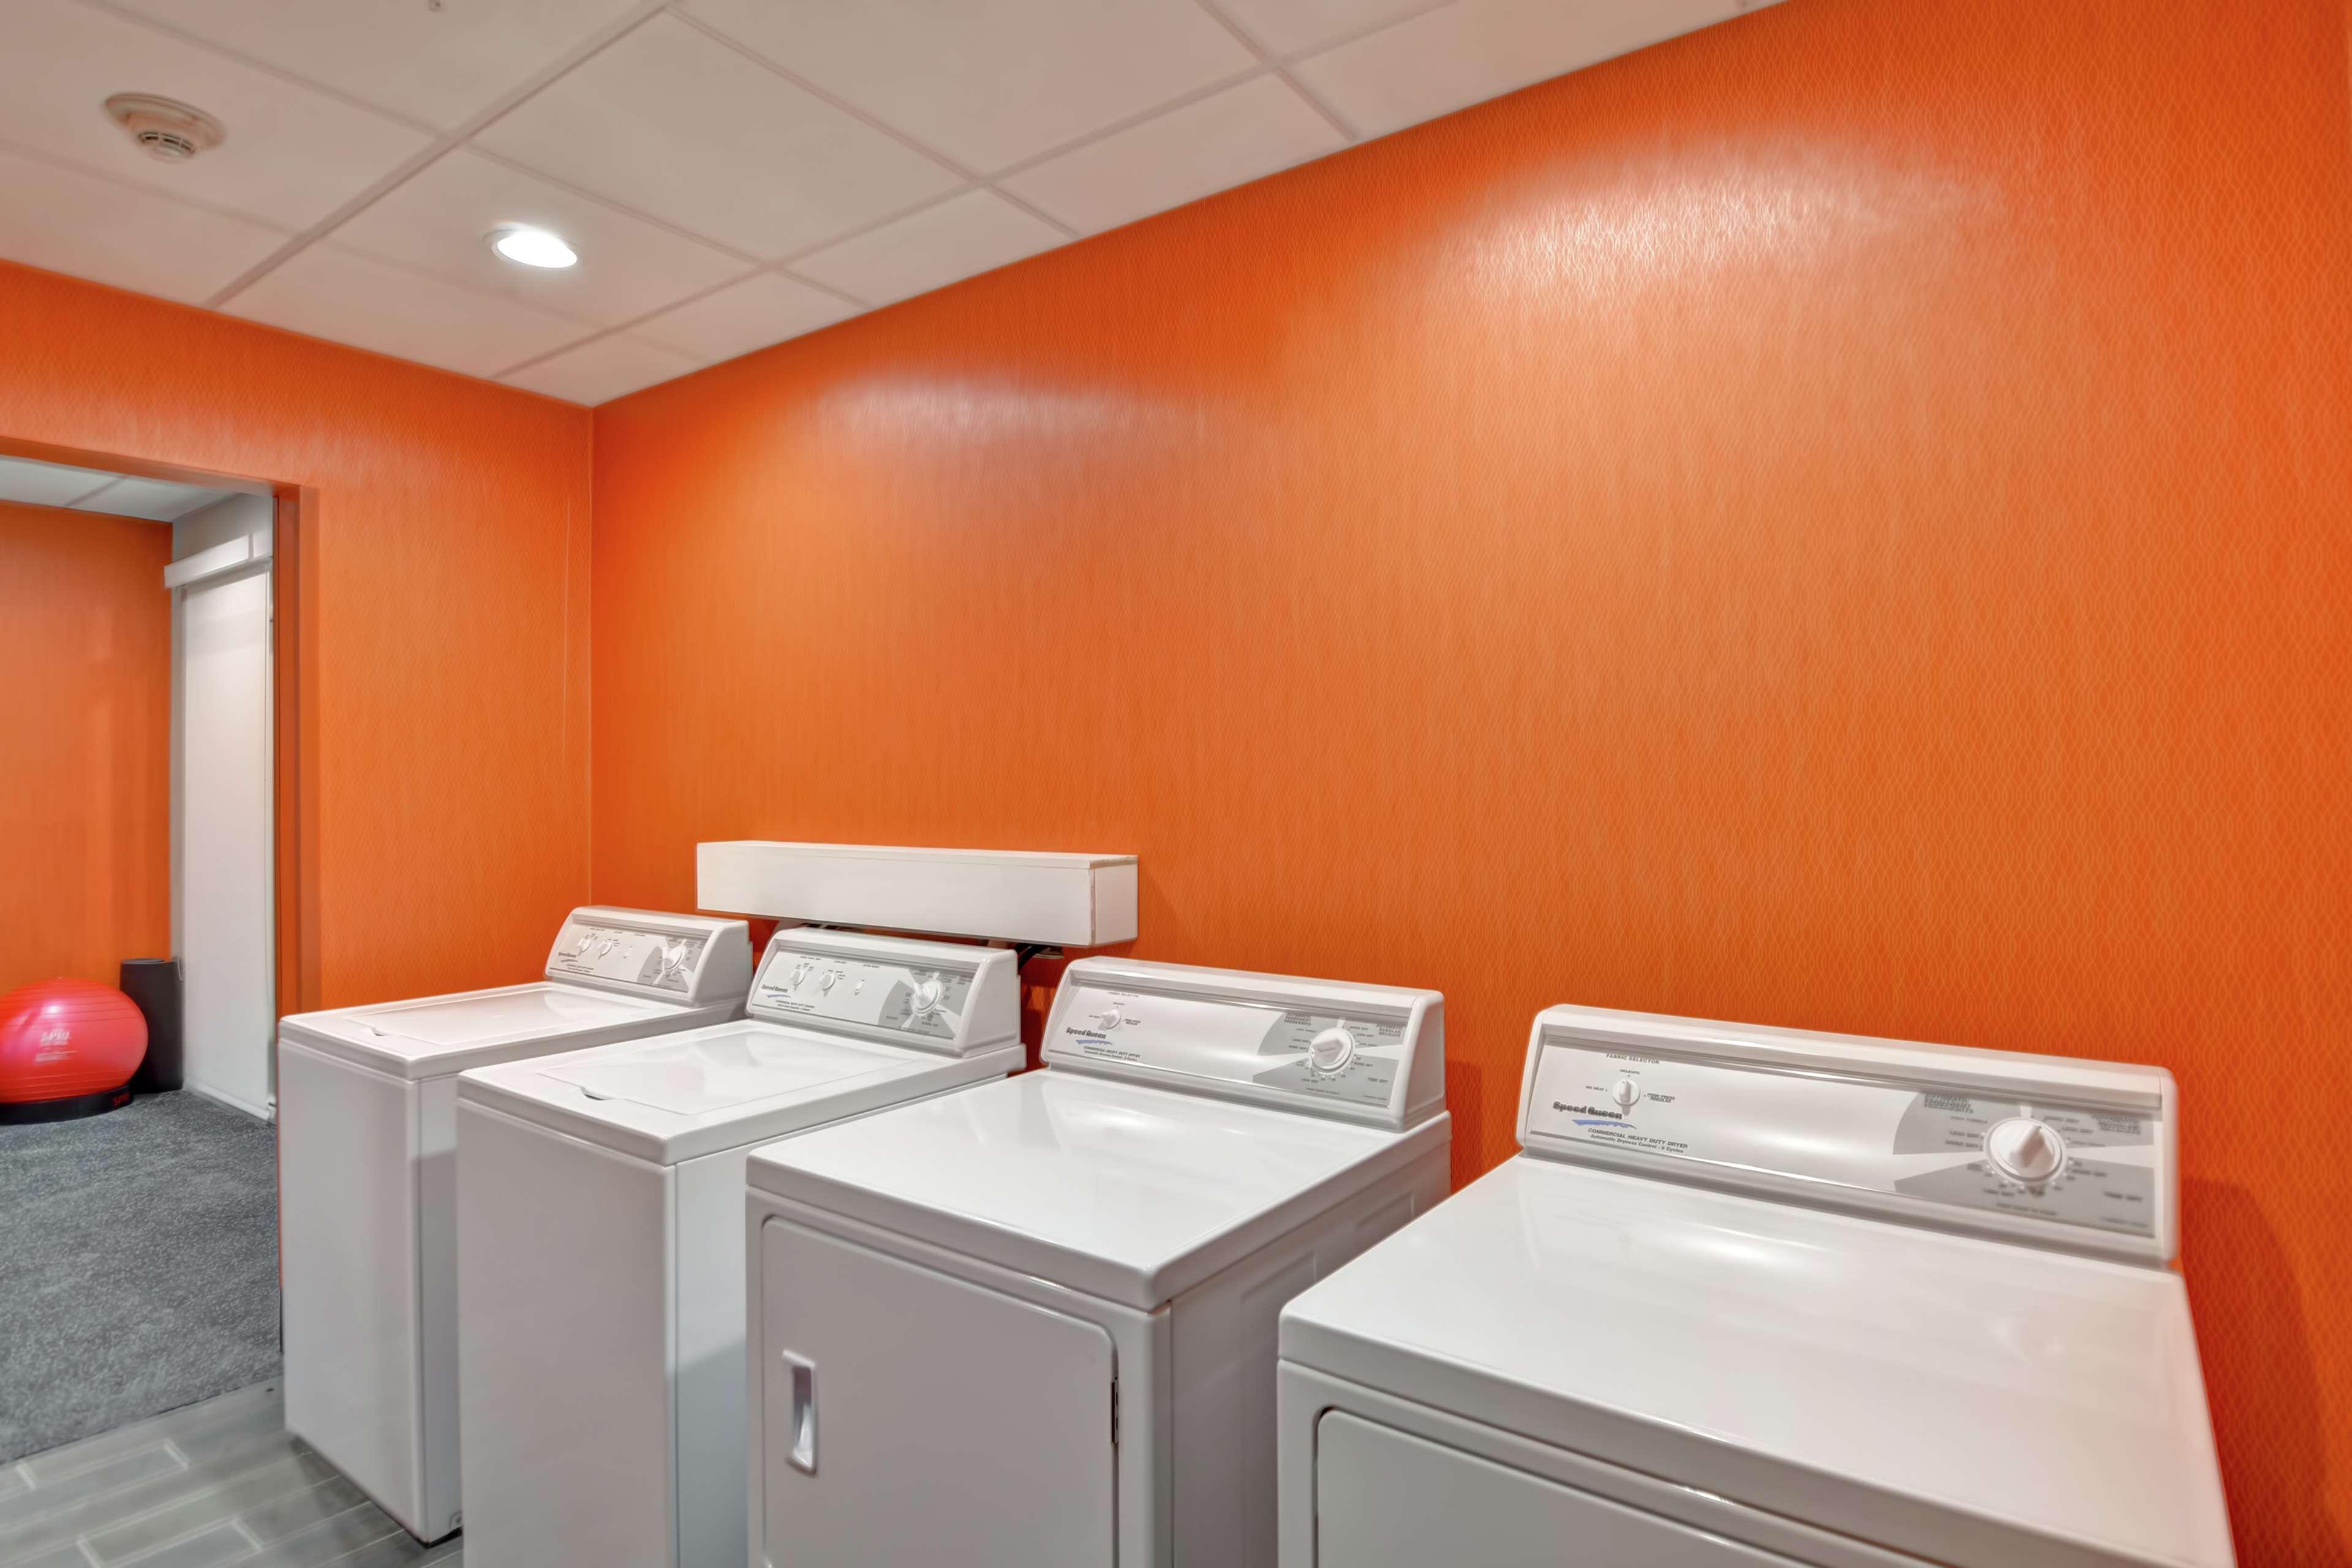 Home2 Suites by Hilton Meridian, MS, Lauderdale